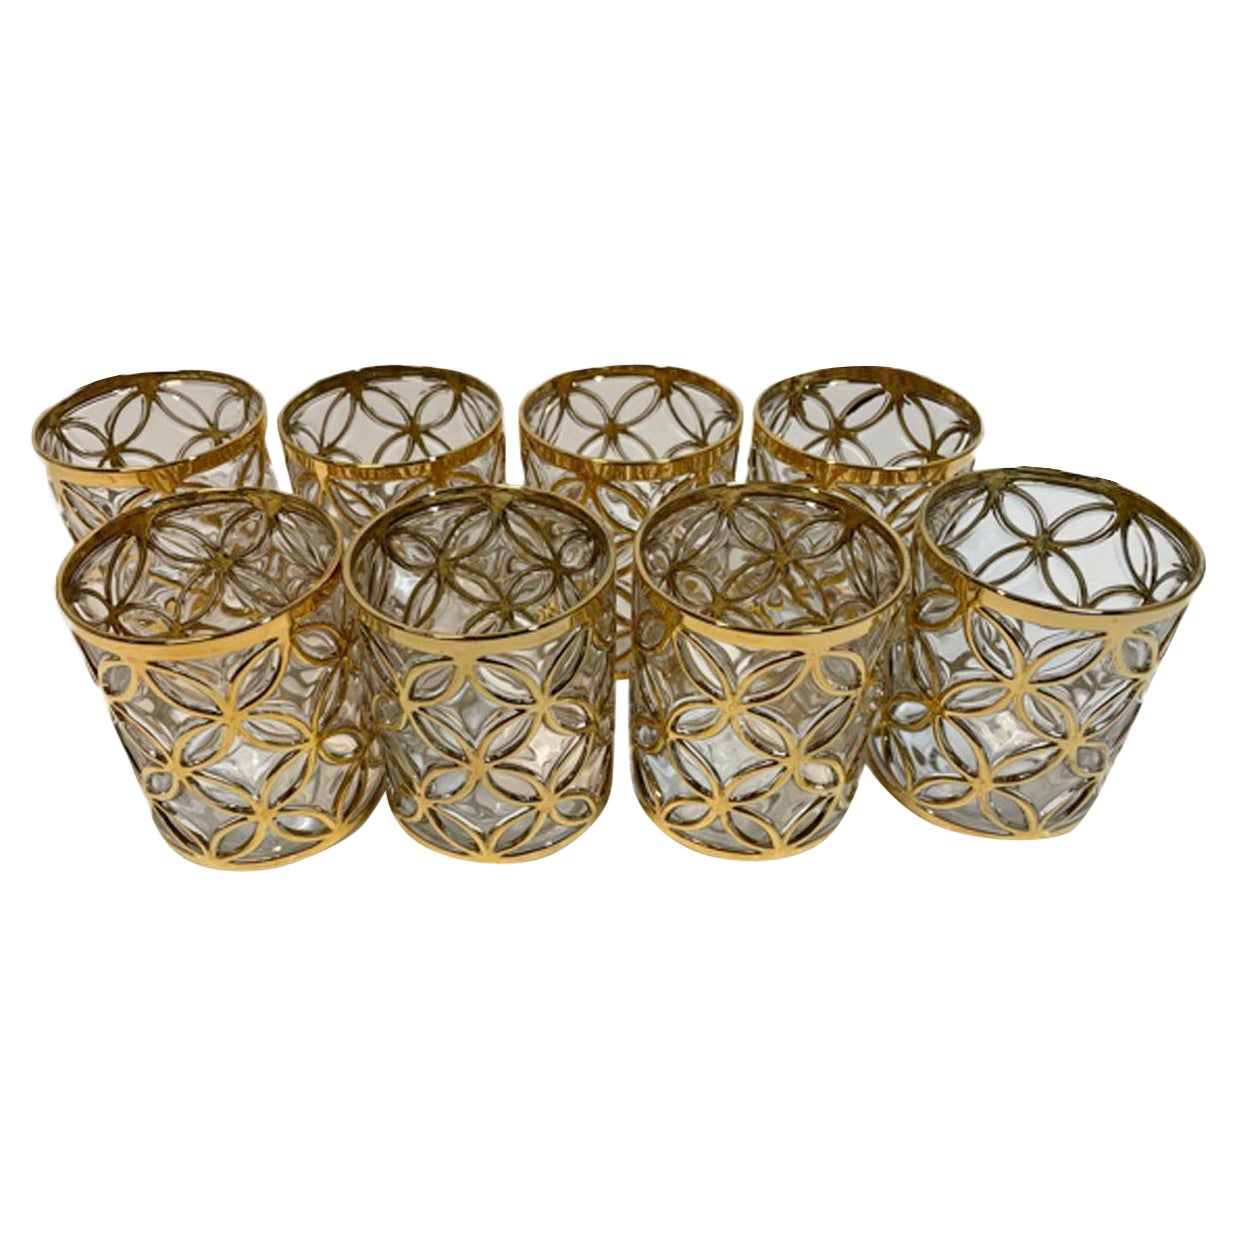 Vintage Imperial Glass Rocks Glasses in the Sortijas de Oro Pattern